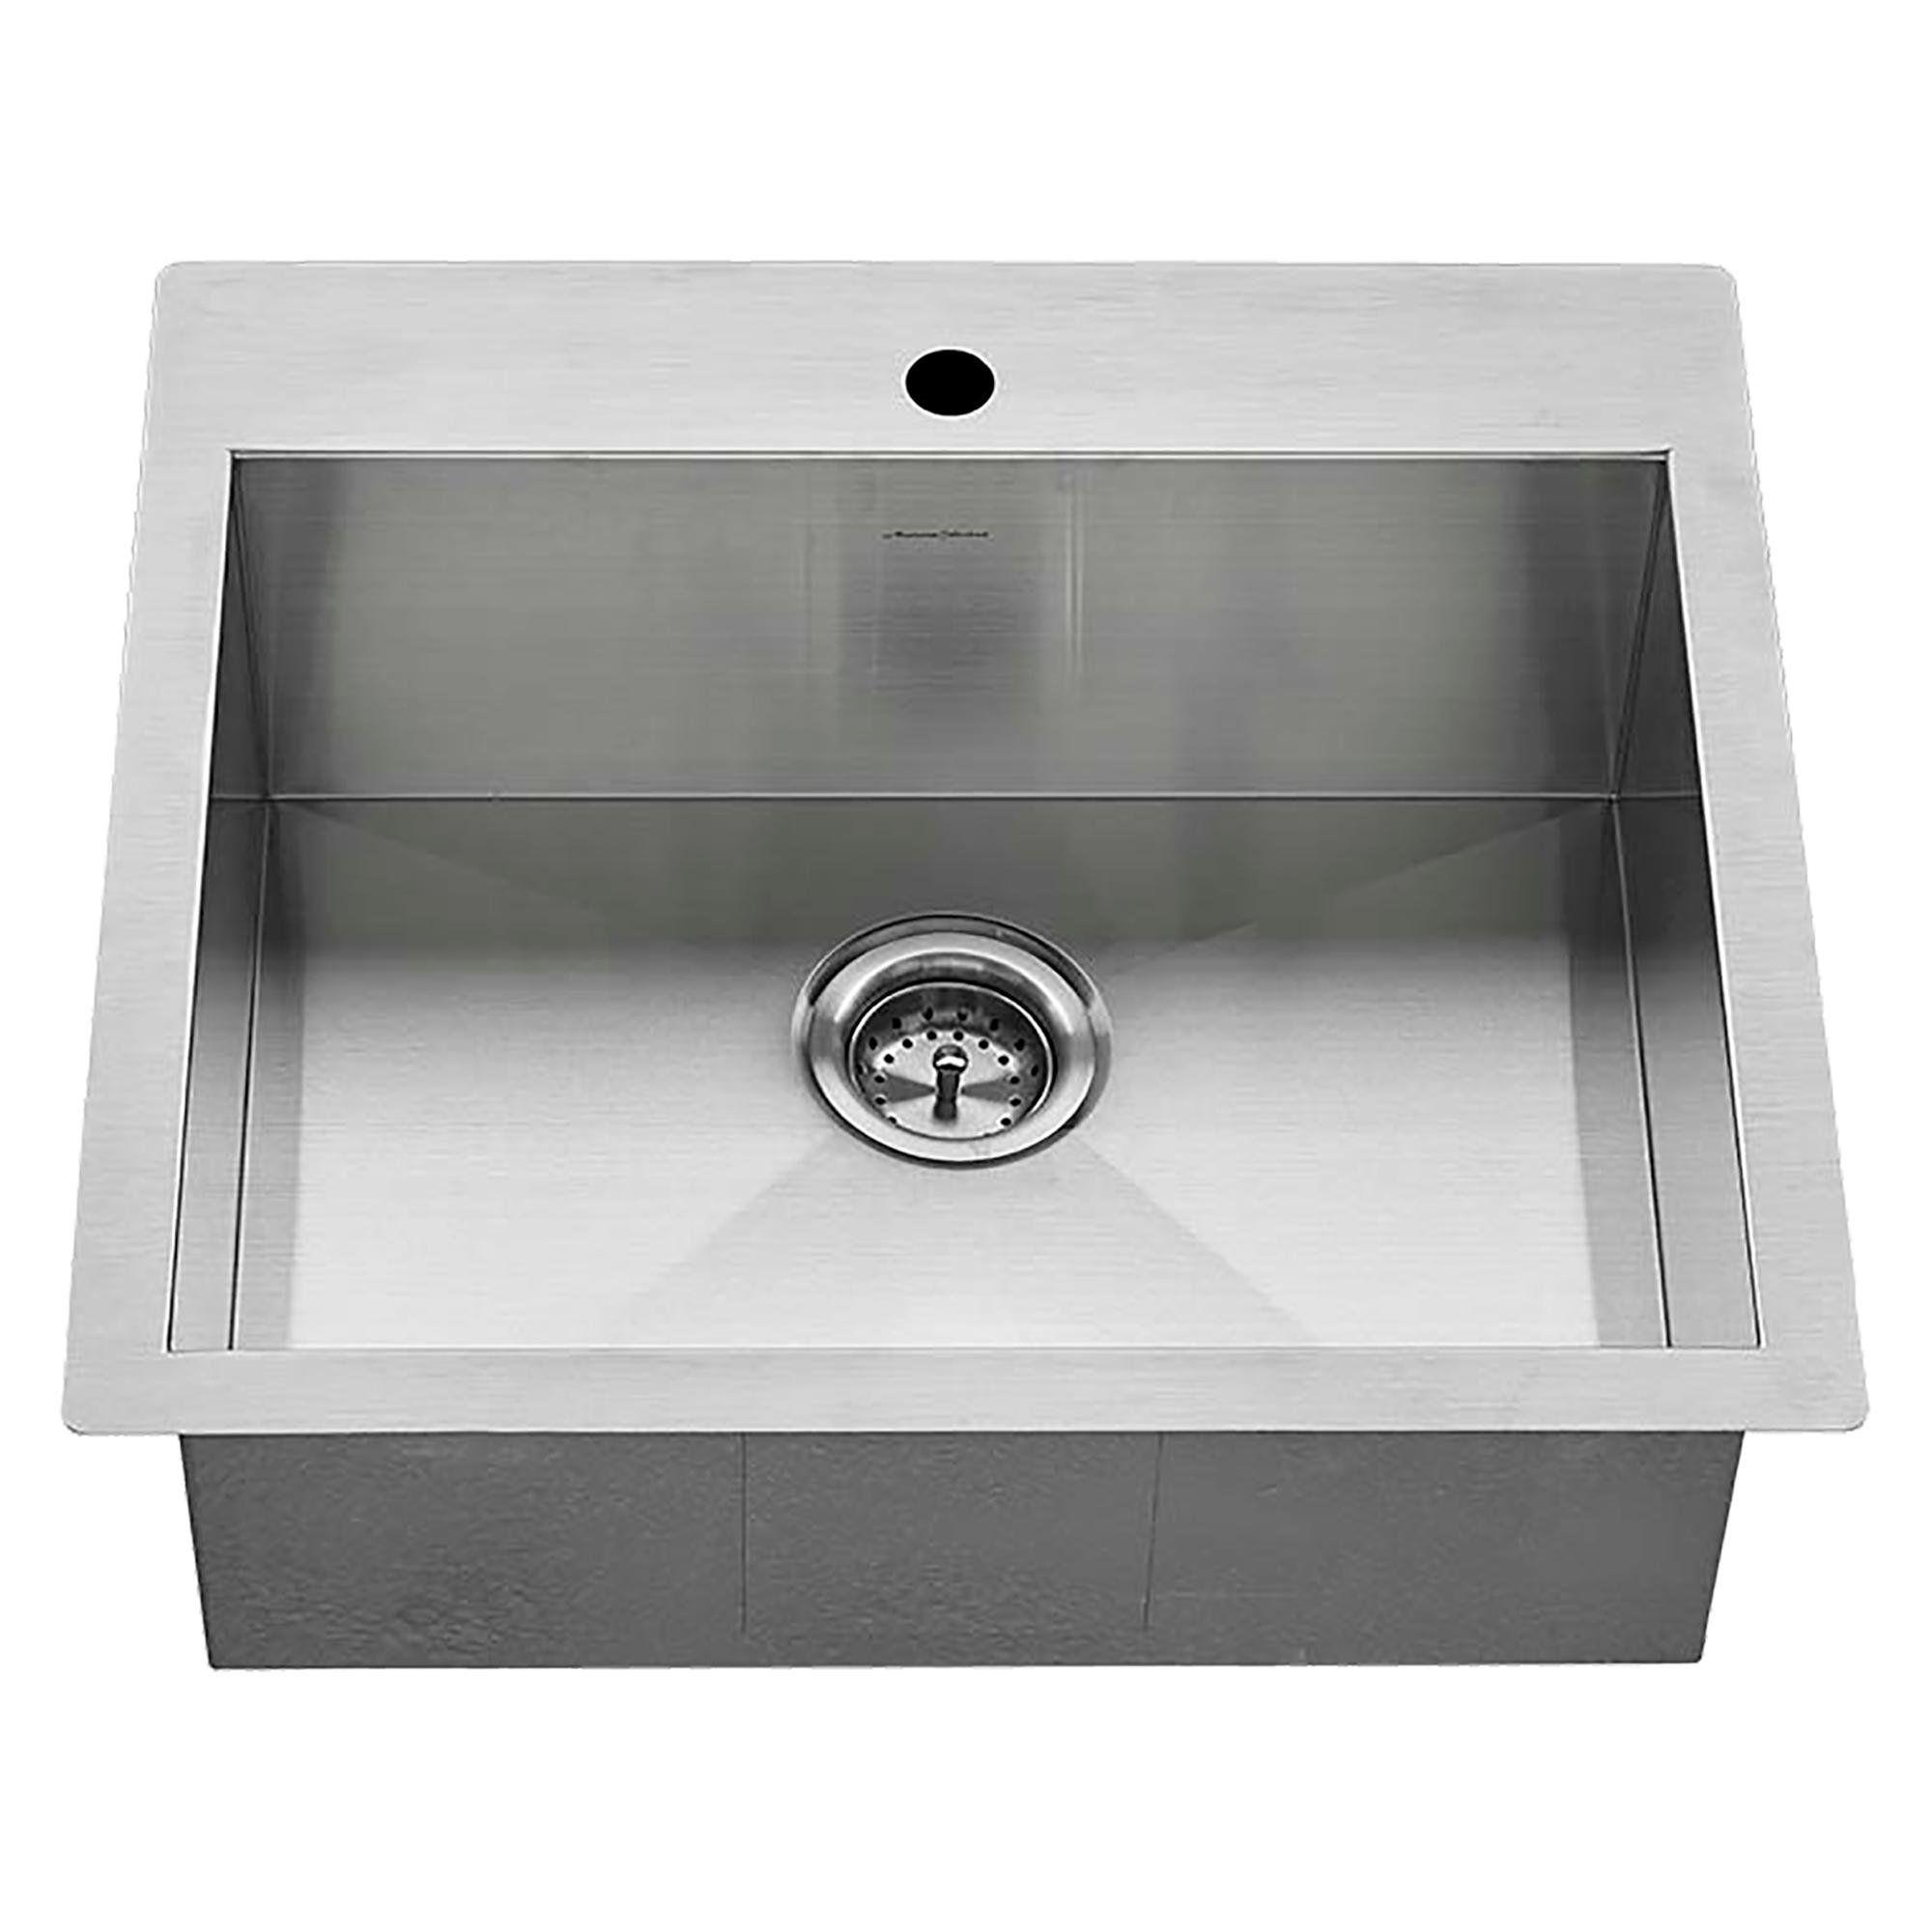 American Standard Edgewater 25x22 Stainless Steel Kitchen Sink Grey Sink Steel Kitchen Sink Drop In Kitchen Sink